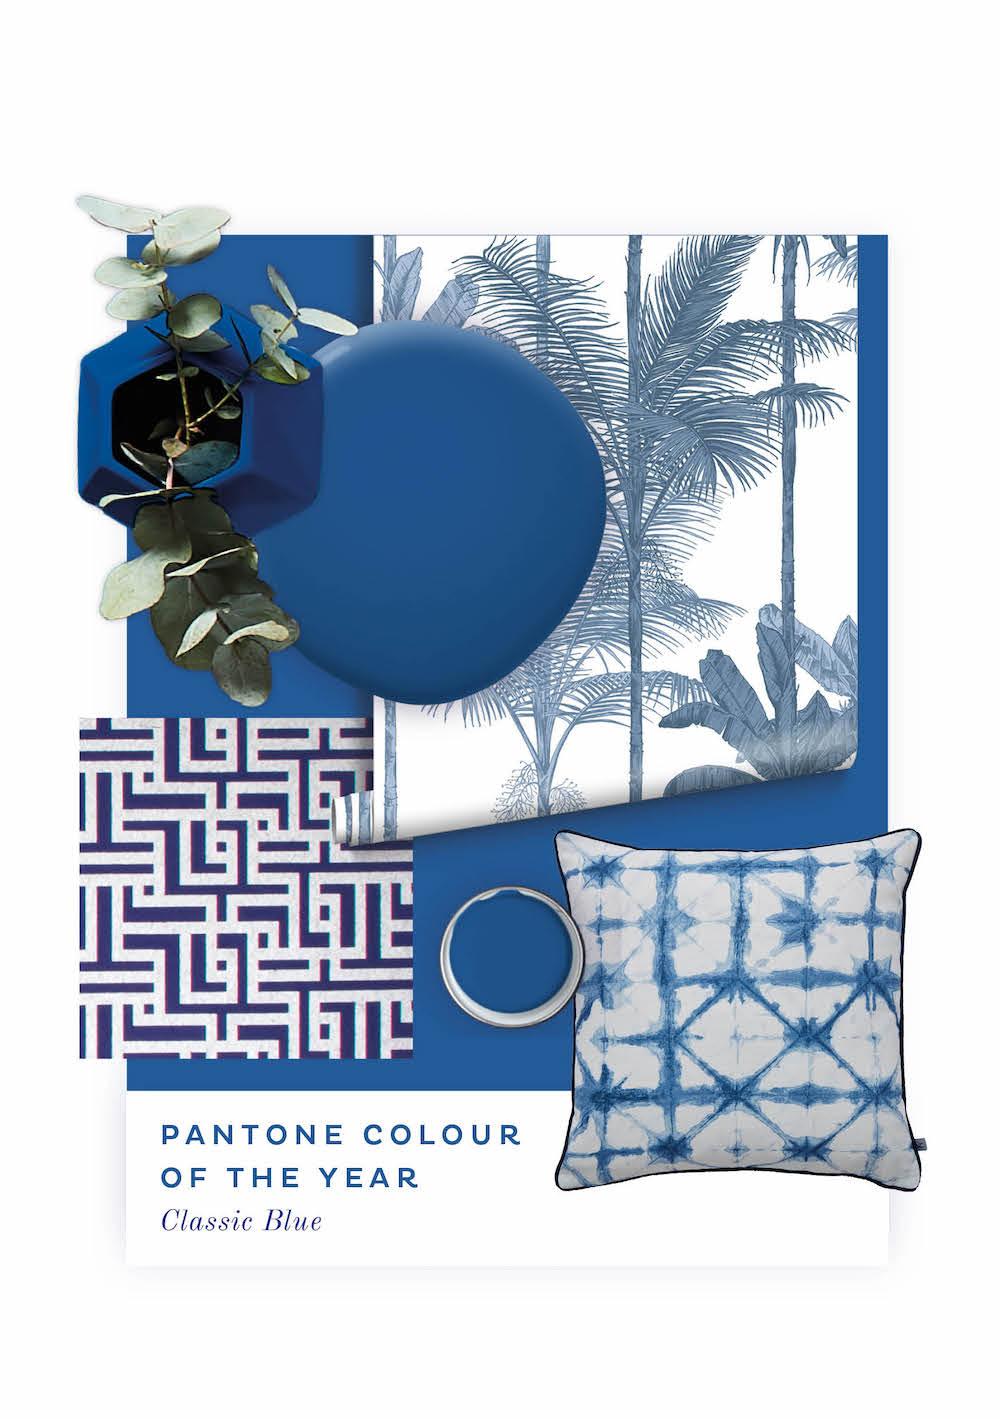 Pantone kleur van het jaar 2020: Classic Blue. #interieur #pantone #classicblue